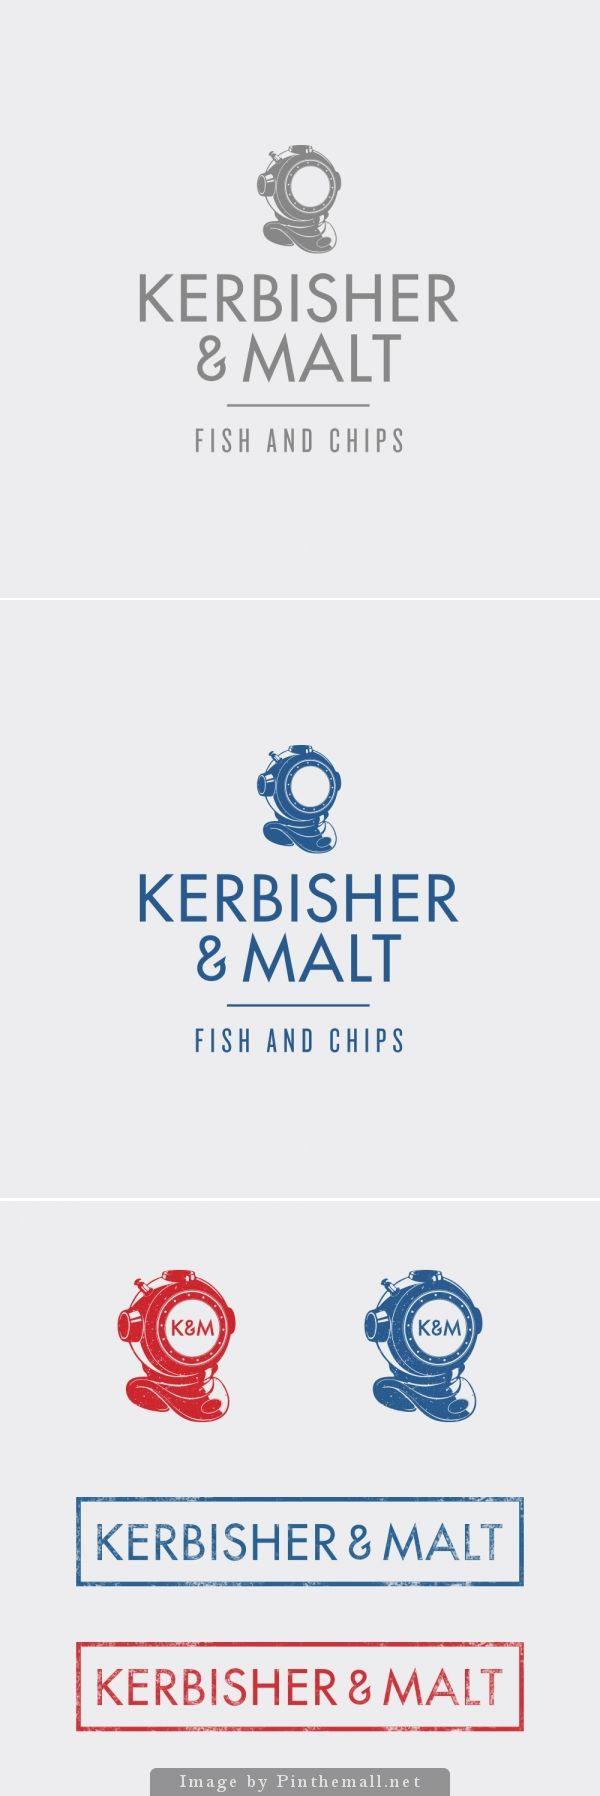 Kerbisher & Malt http://bezigncreative.com/avada_portfolio/kerbisher-malt/